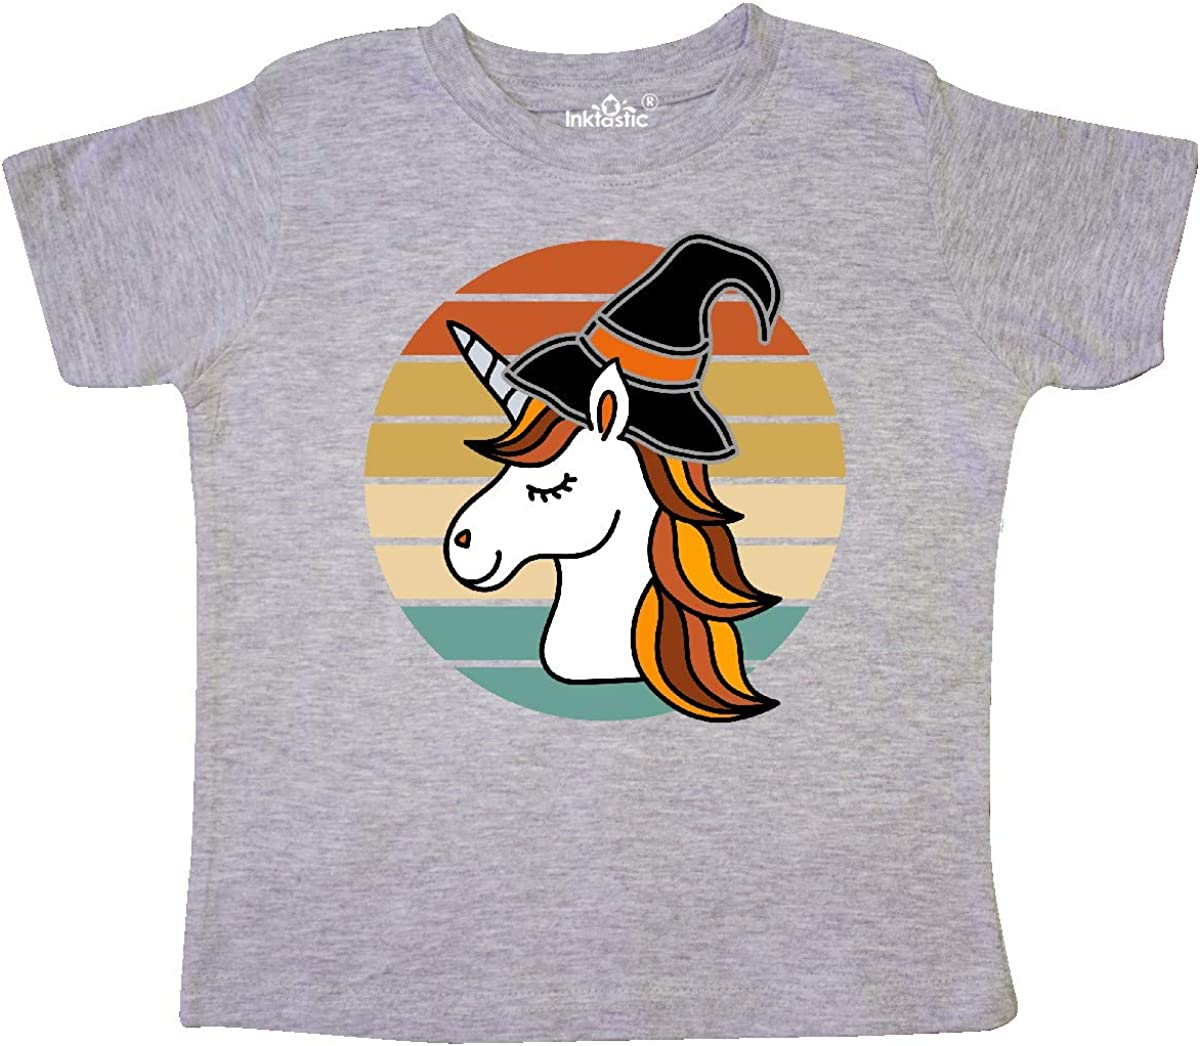 inktastic Halloween Unicorn Retro Witch Toddler T-Shirt